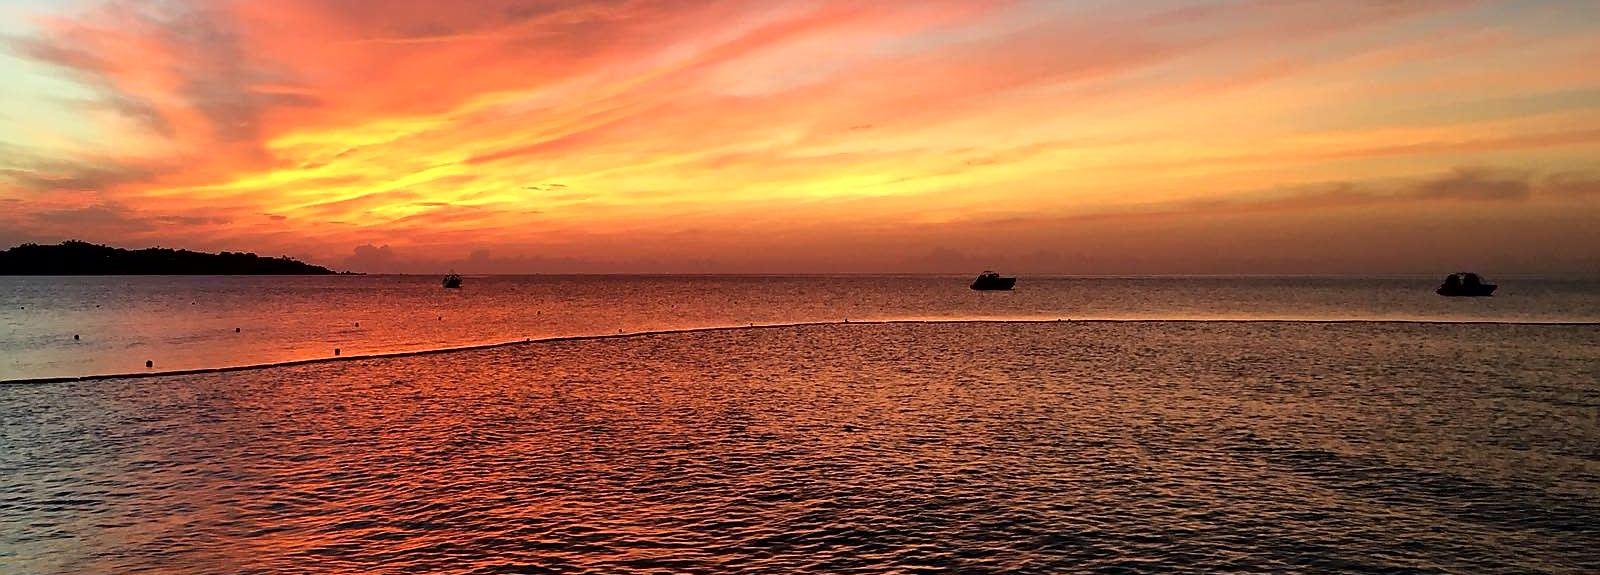 Laem Sor Beach, Na Mueang, Ko Samui District, Surat Thani, Thailand